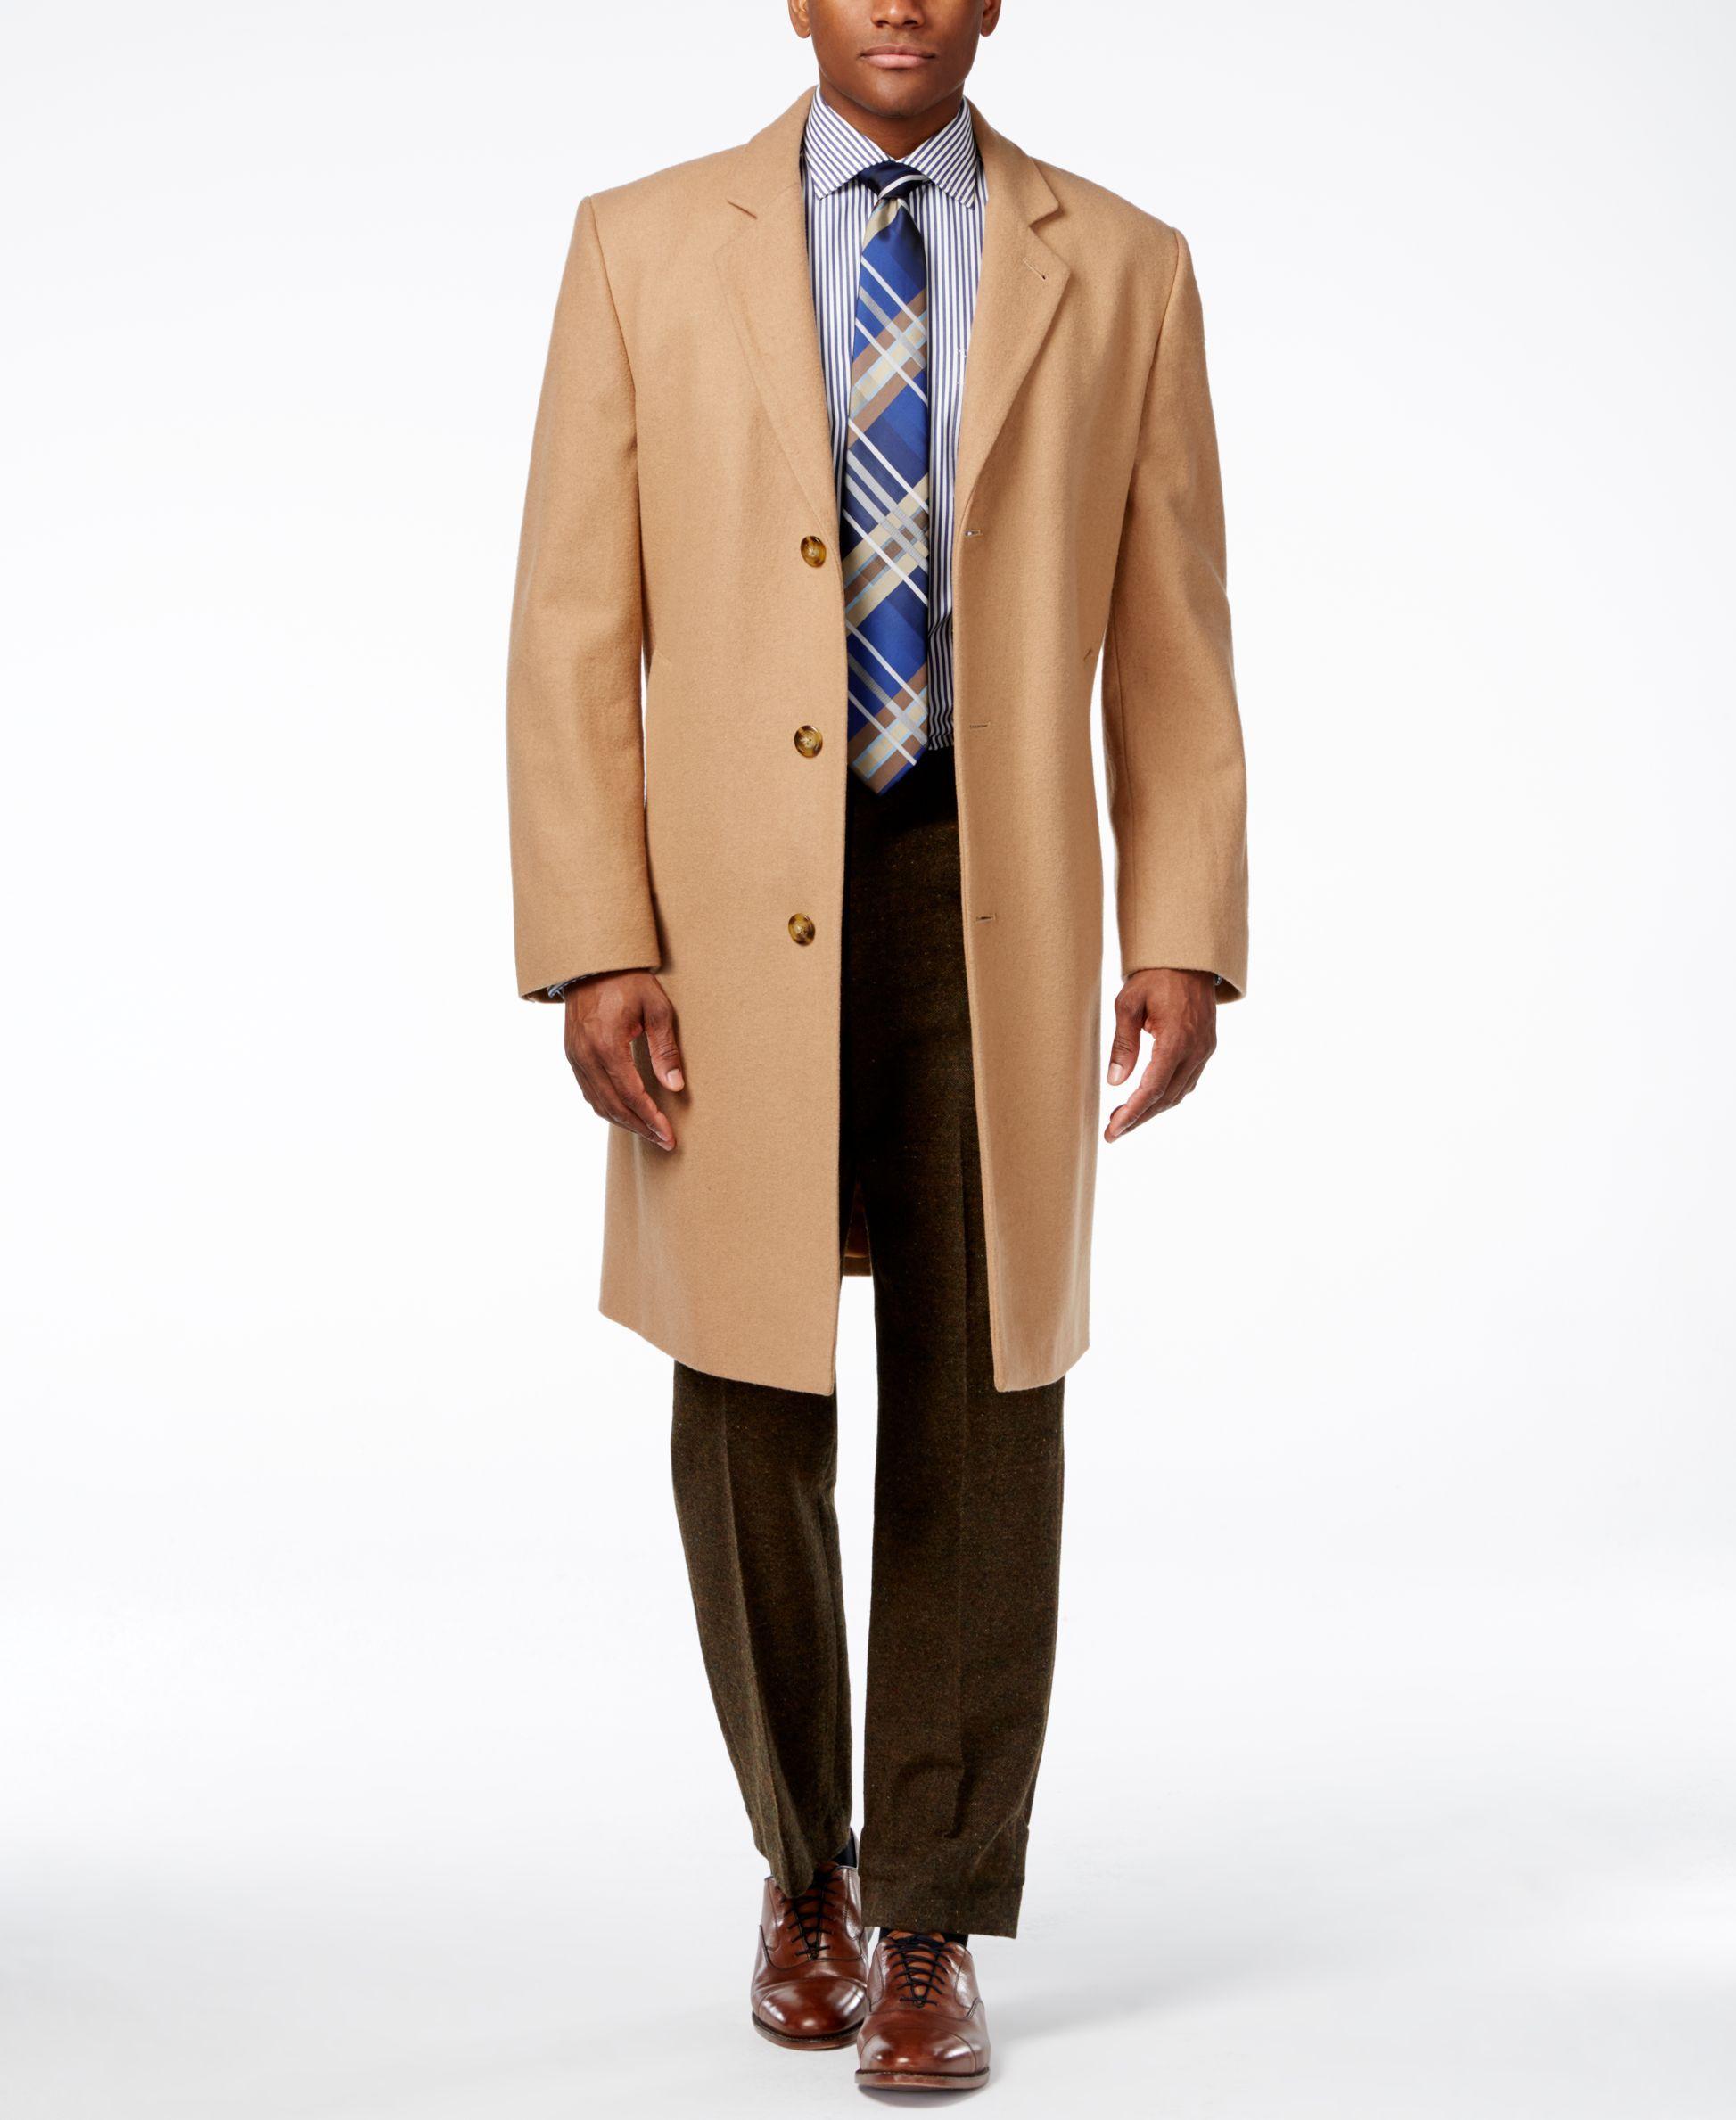 London Fog mens Signature Wool Blend Top Coat Wool Blend Coat